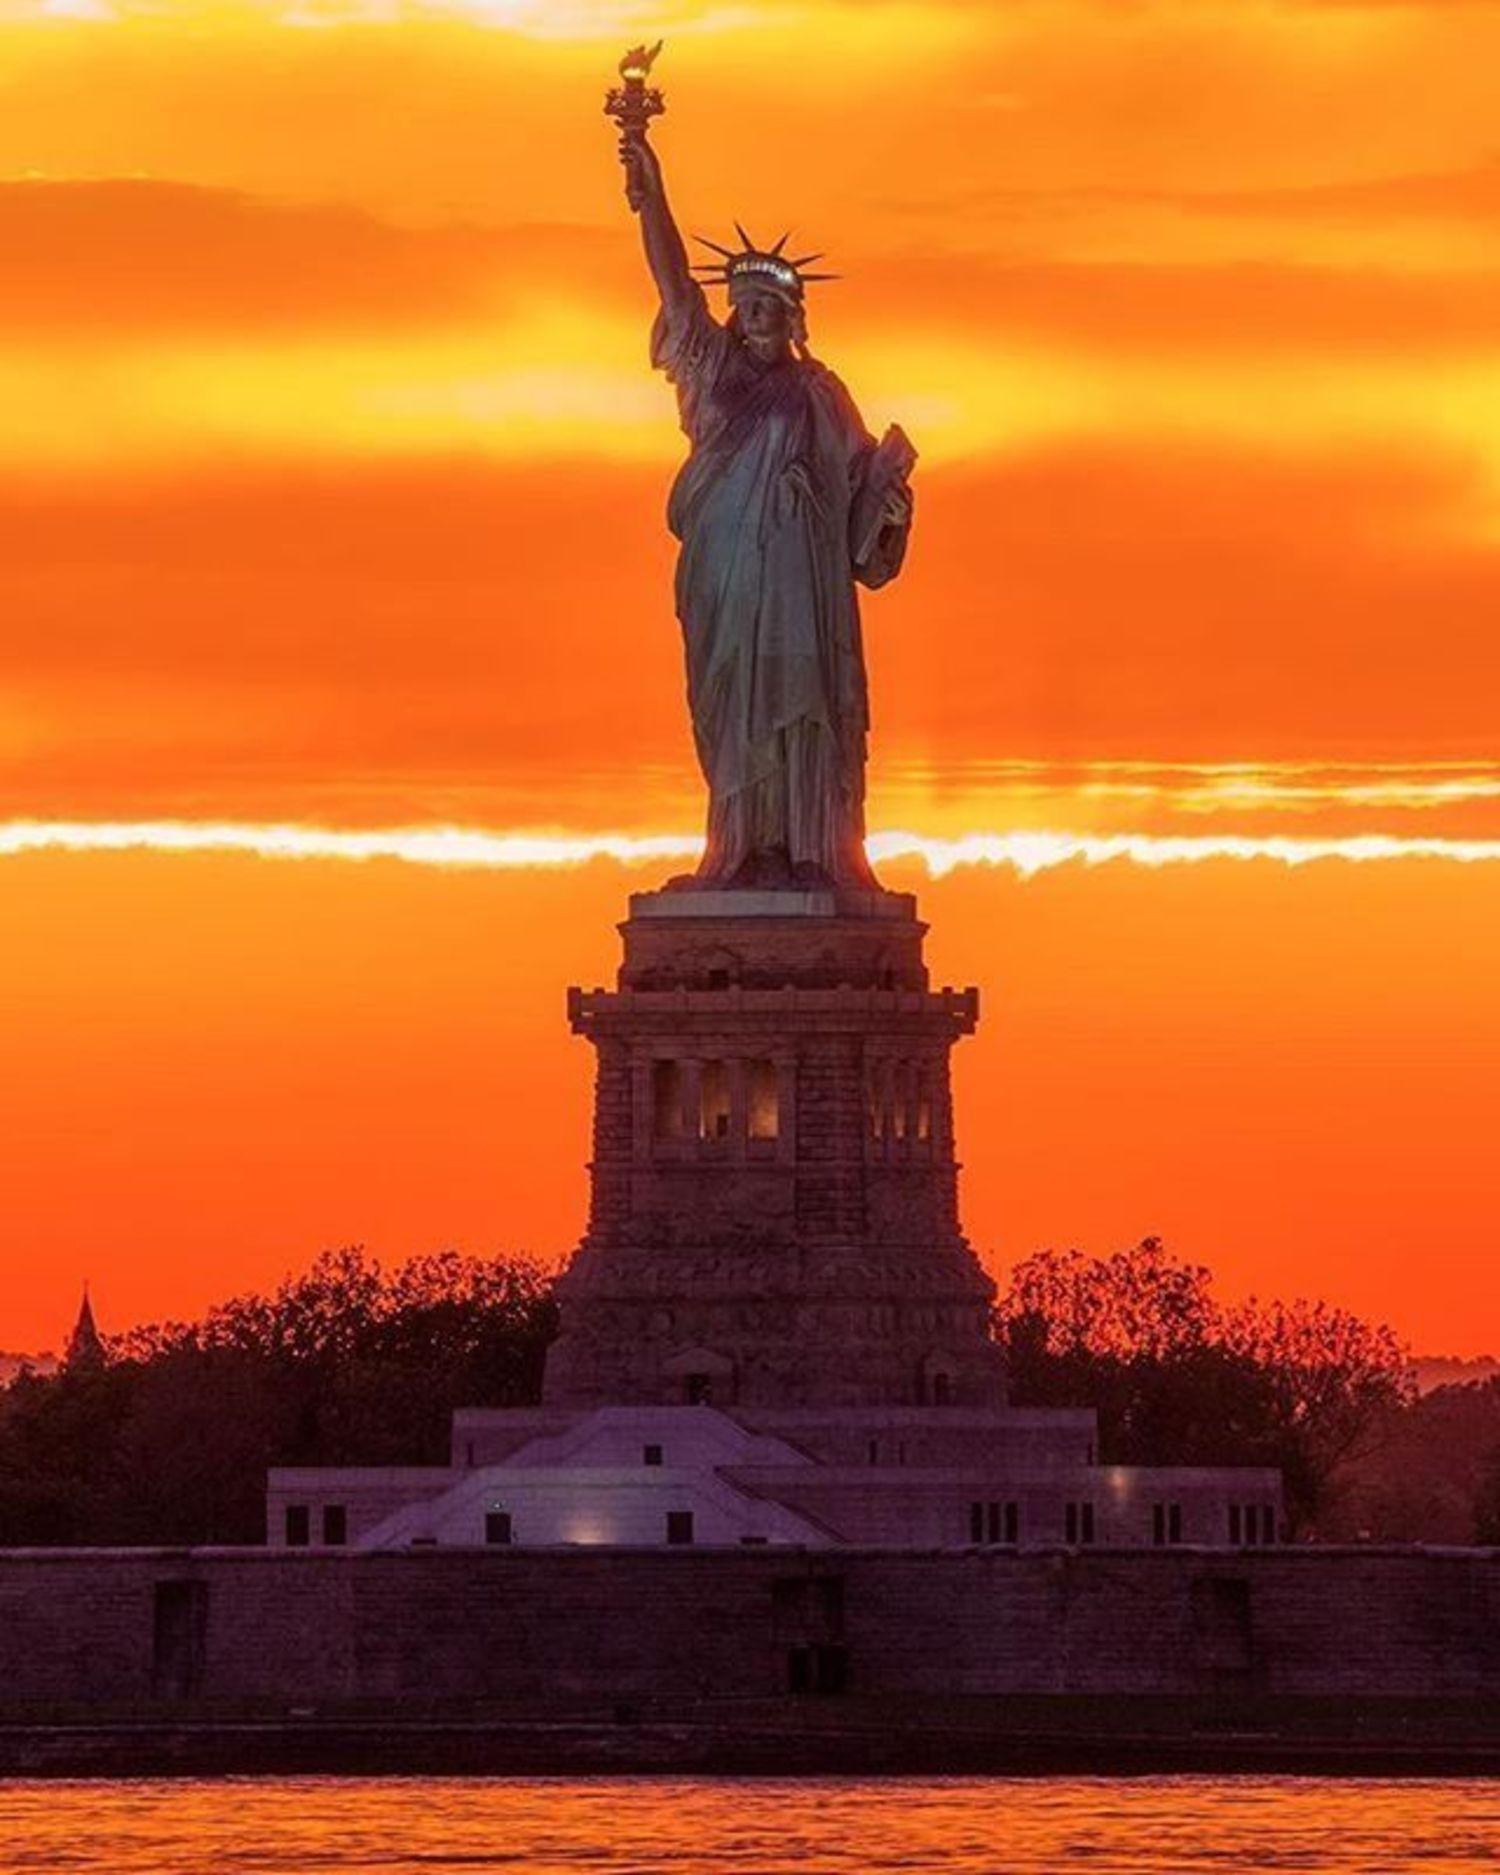 Statue of Liberty, New York, New York. Photo via @gettyphotography #viewingnyc